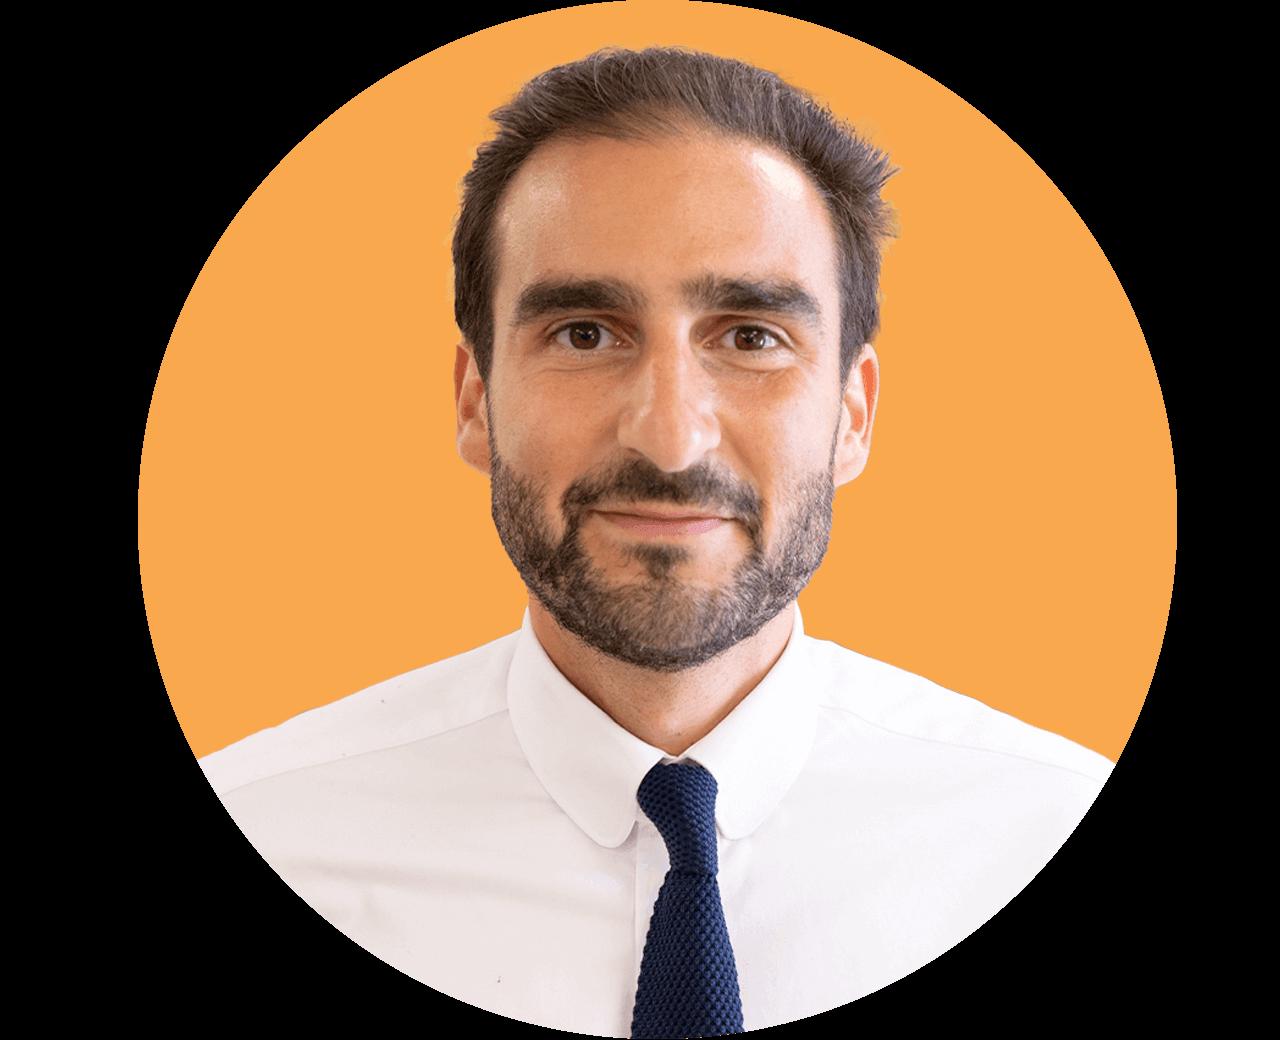 Mickaël Cabrol - Managing Director, EMEA